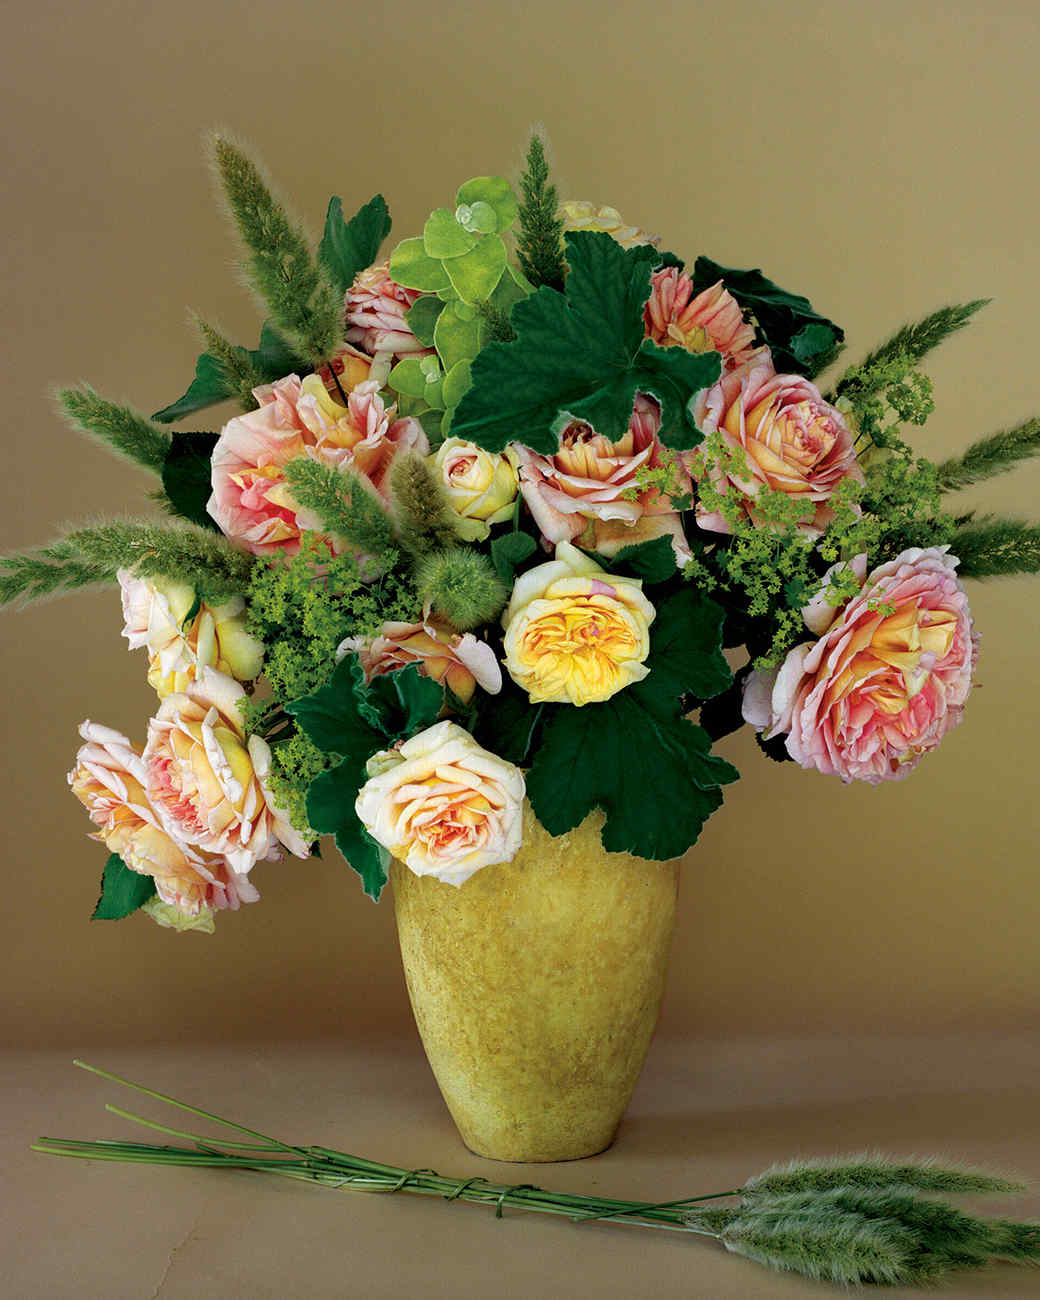 ma105318_0111_13_flower.jpg